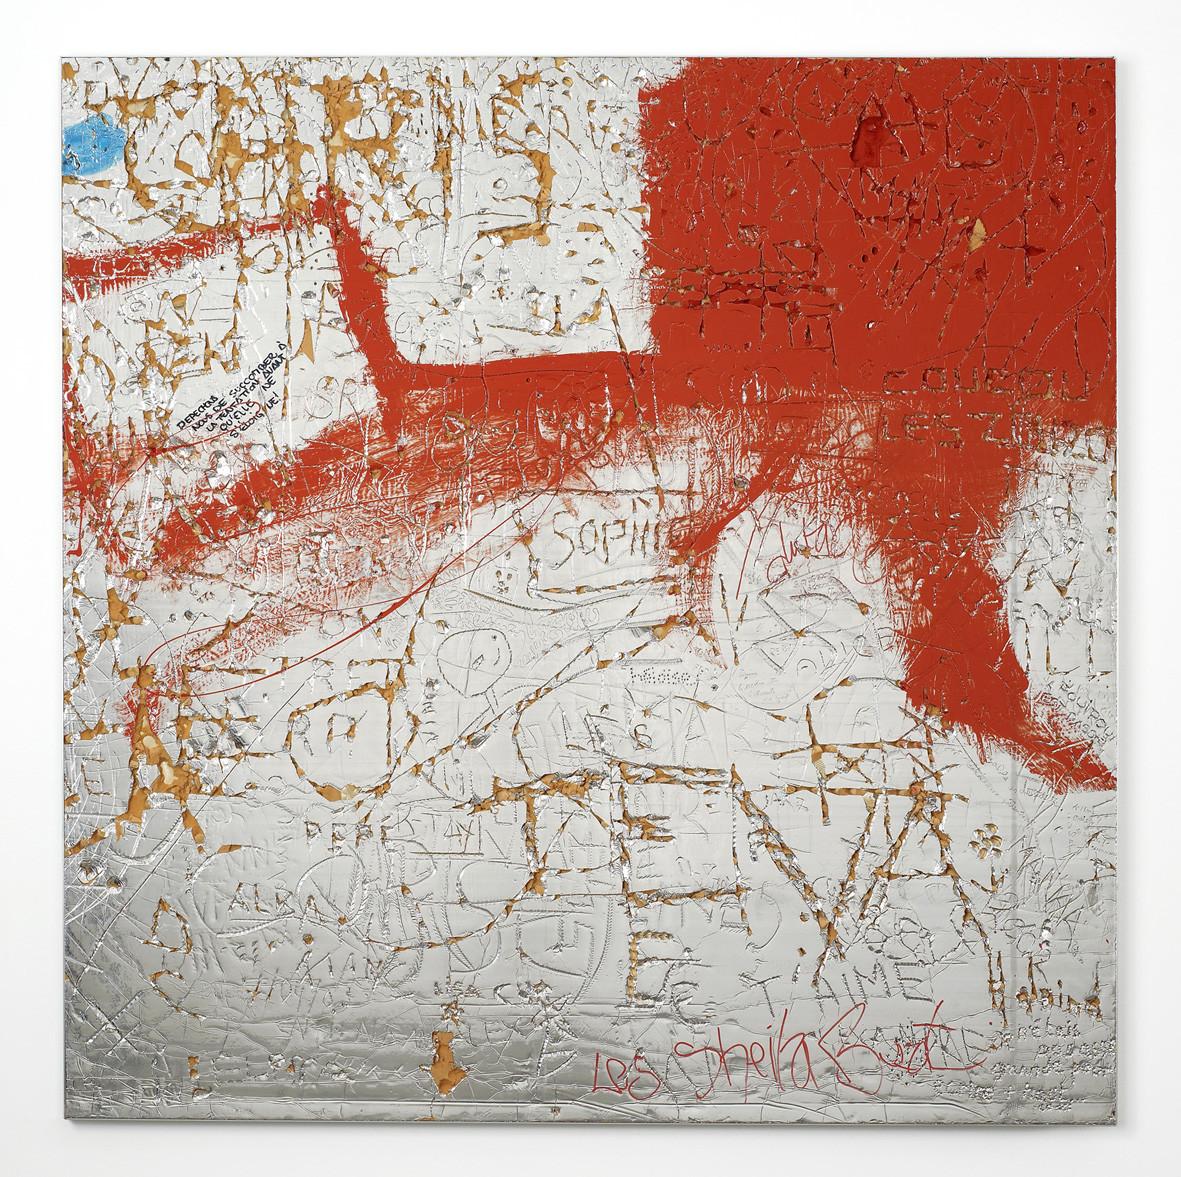 "<div class=""title""><em>Untitled</em>, 2002</div><div class=""medium"">acrylic paint, ink, celotex insulation board, wood, aluminium</div><div class=""dimensions"">120.8 x 120.8 x 2.5 cm<br />47 1/2 x 47 1/2 x 1 in.</div>"